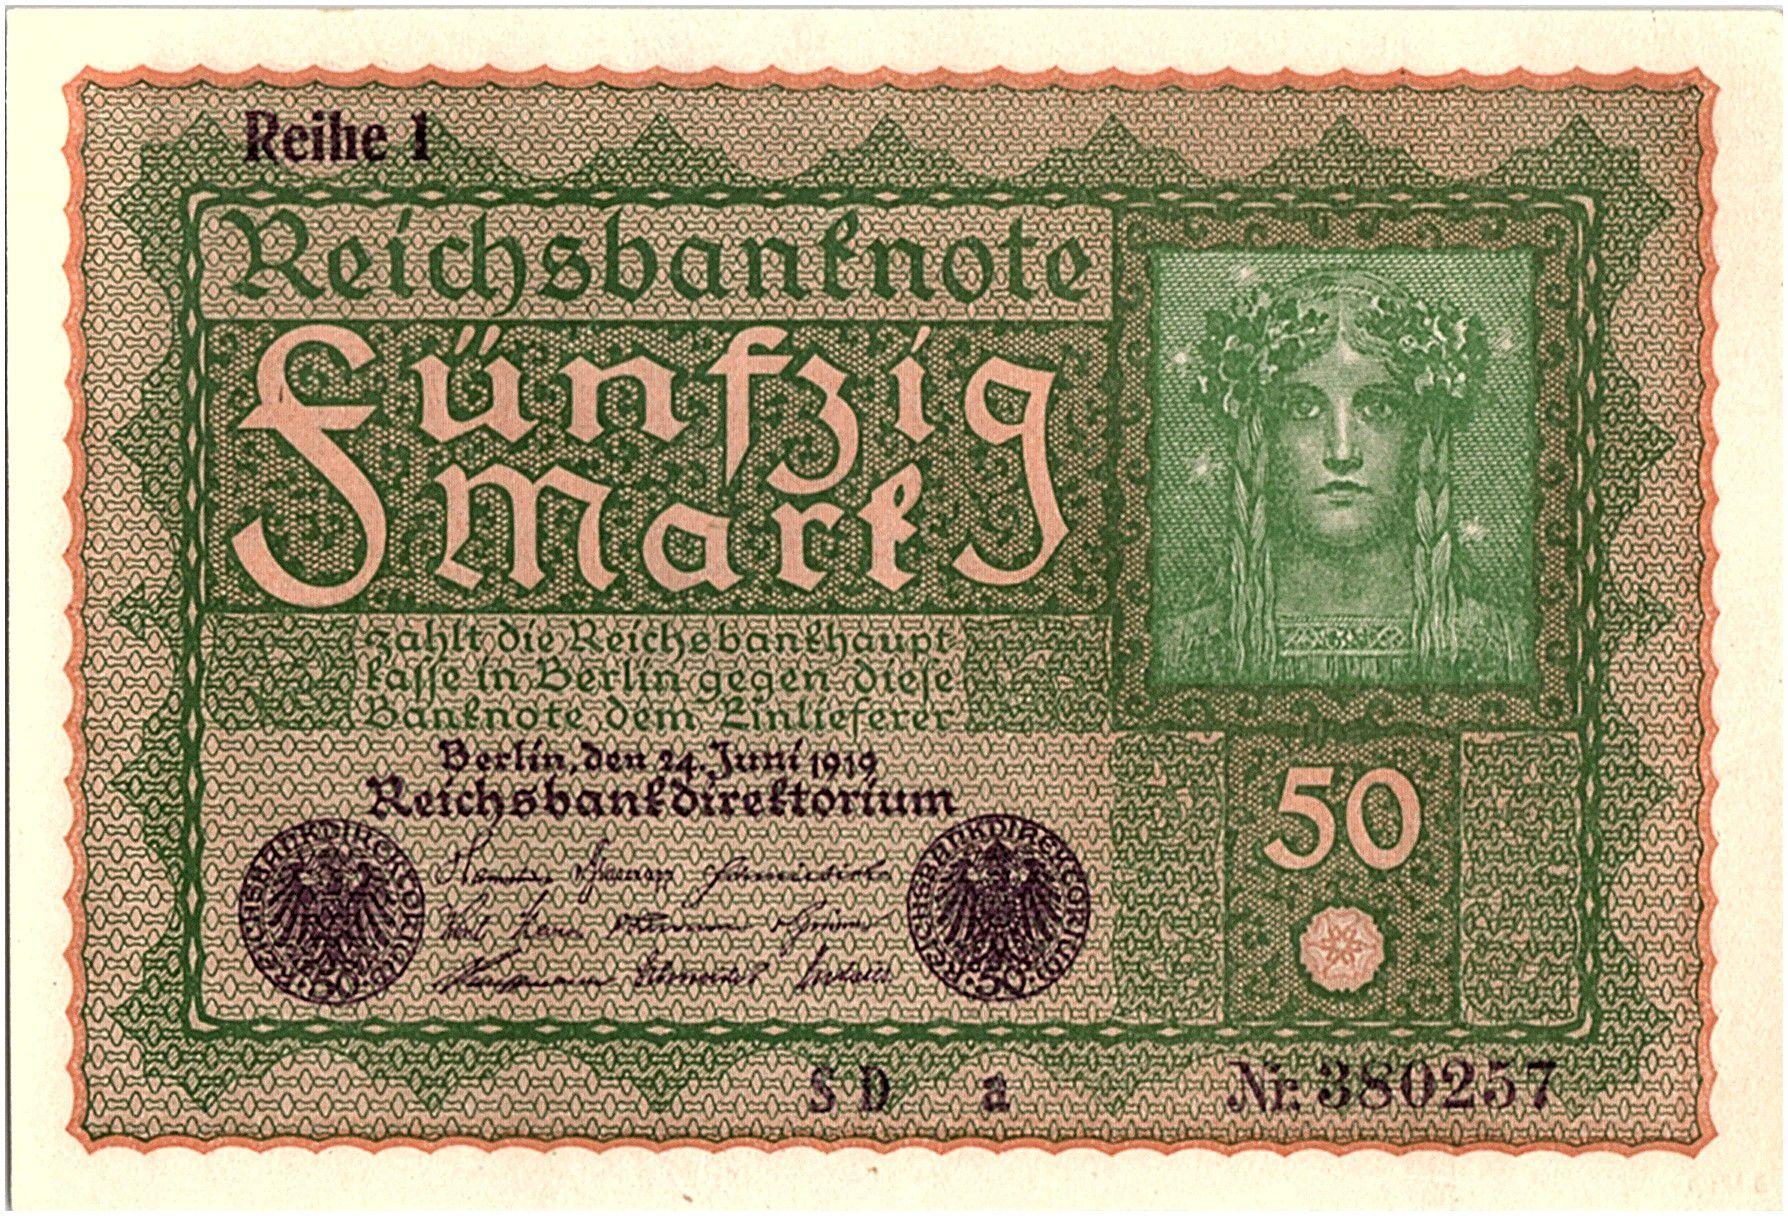 Allemagne 50 Mark Portrait de femme - 1919 - Reihe 1 Série SD a - p.NEUF - P.66